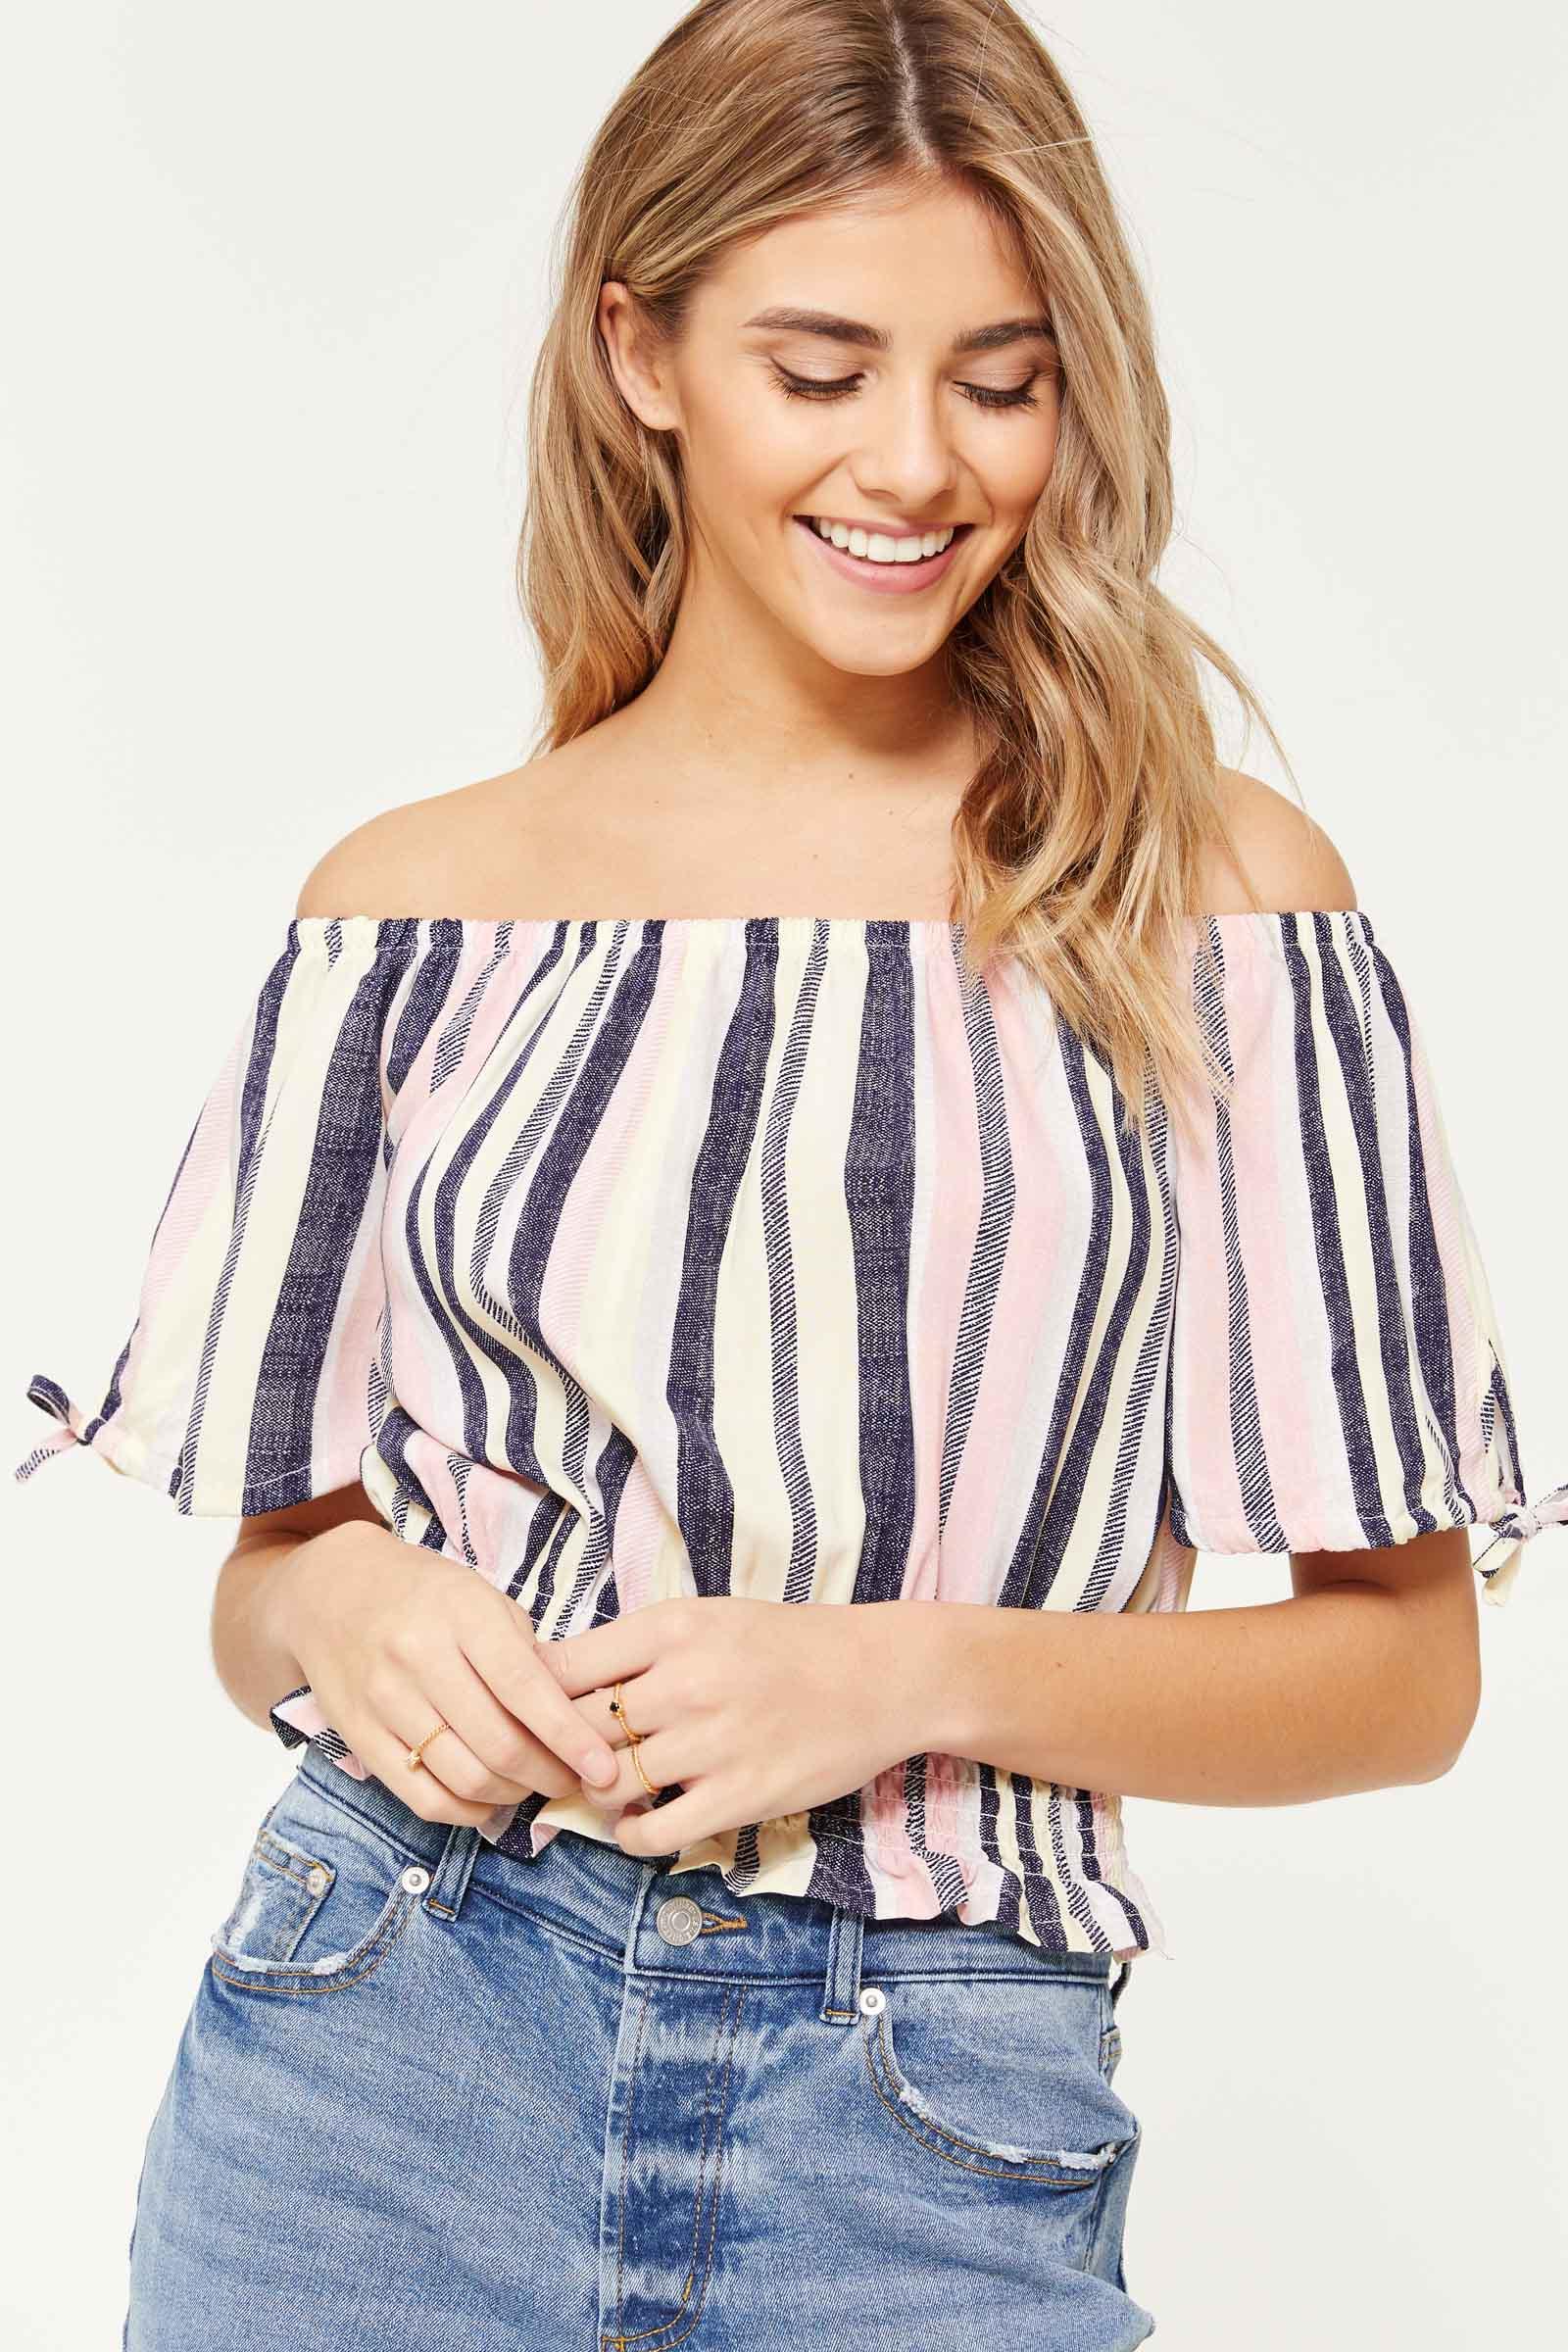 890659ca454b47 Striped Smocked Off Shoulder T-shirt - Clothing